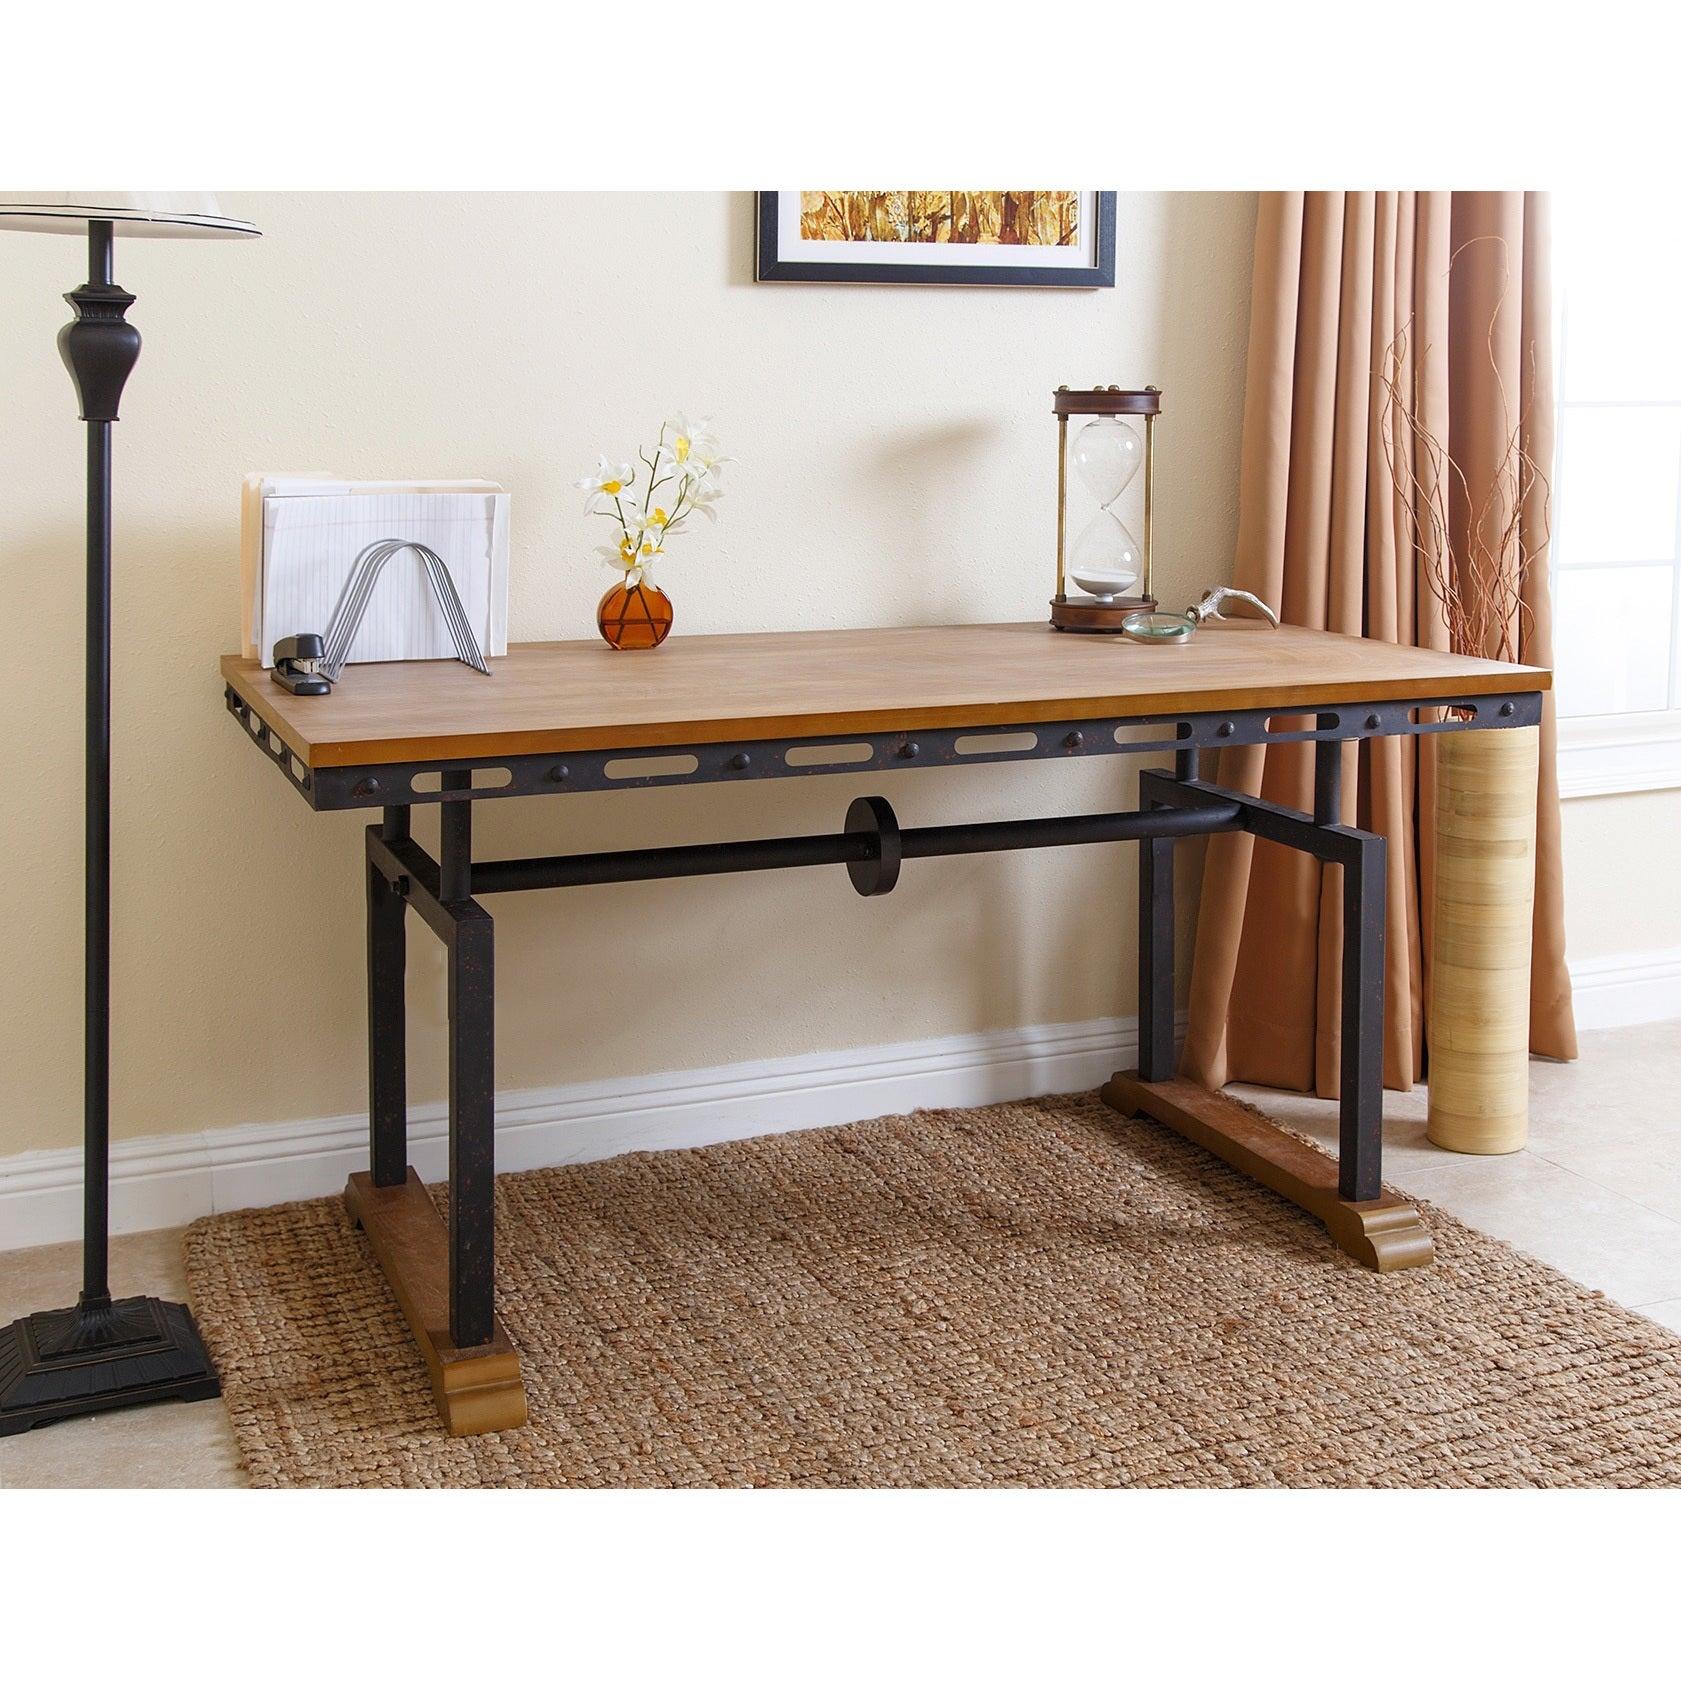 shop abbyson northwood industrial rustic writing desk on sale rh overstock com industrial style writing desk industrial style writing desk